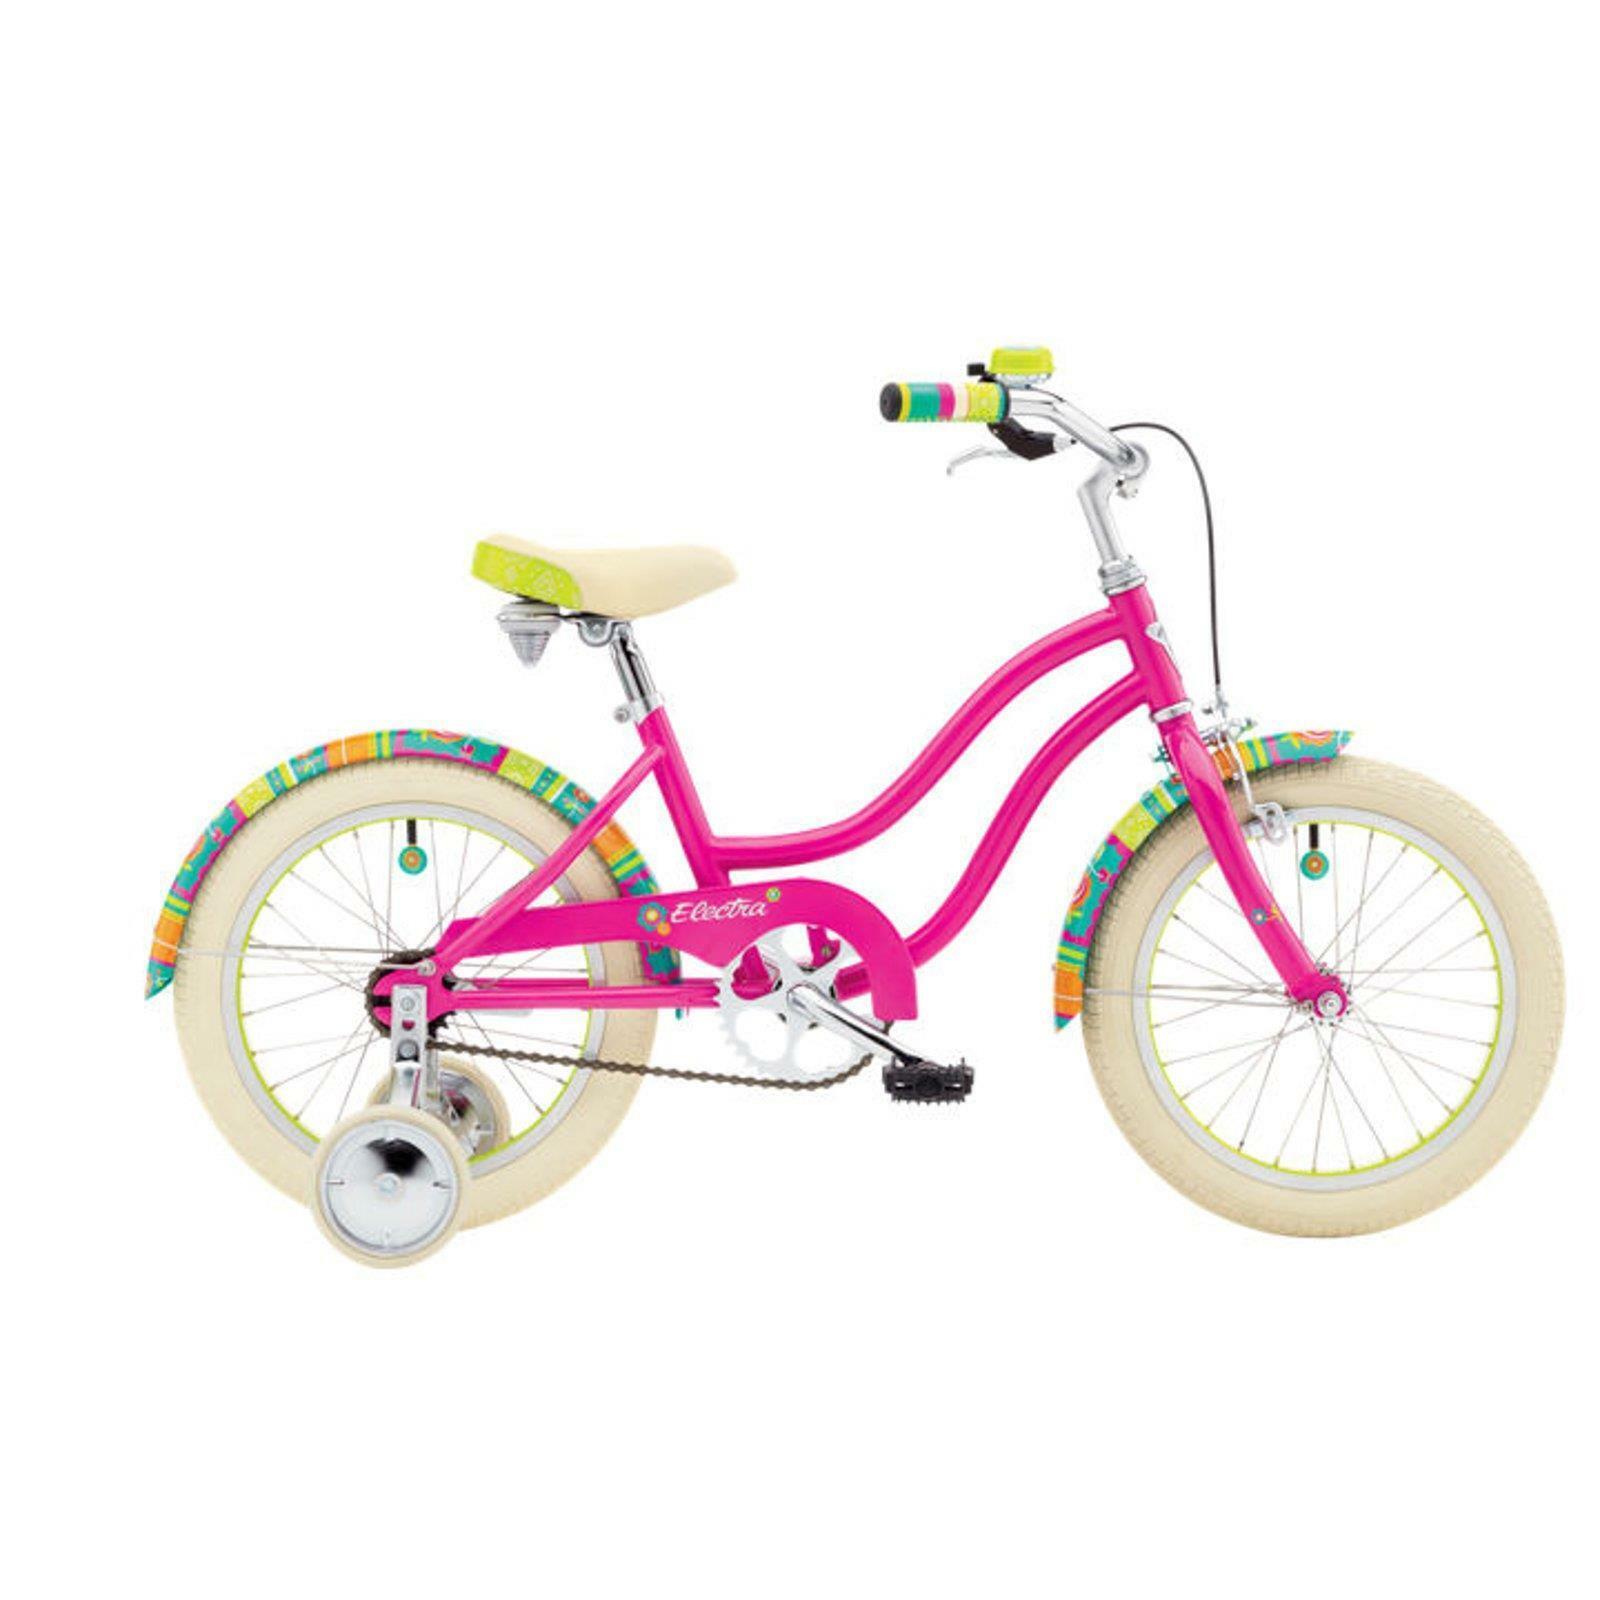 Electra Water Lily 1 Mädchen Fahrrad 16 Zoll Rosa Beachcruiser Rosa Kinder Rad